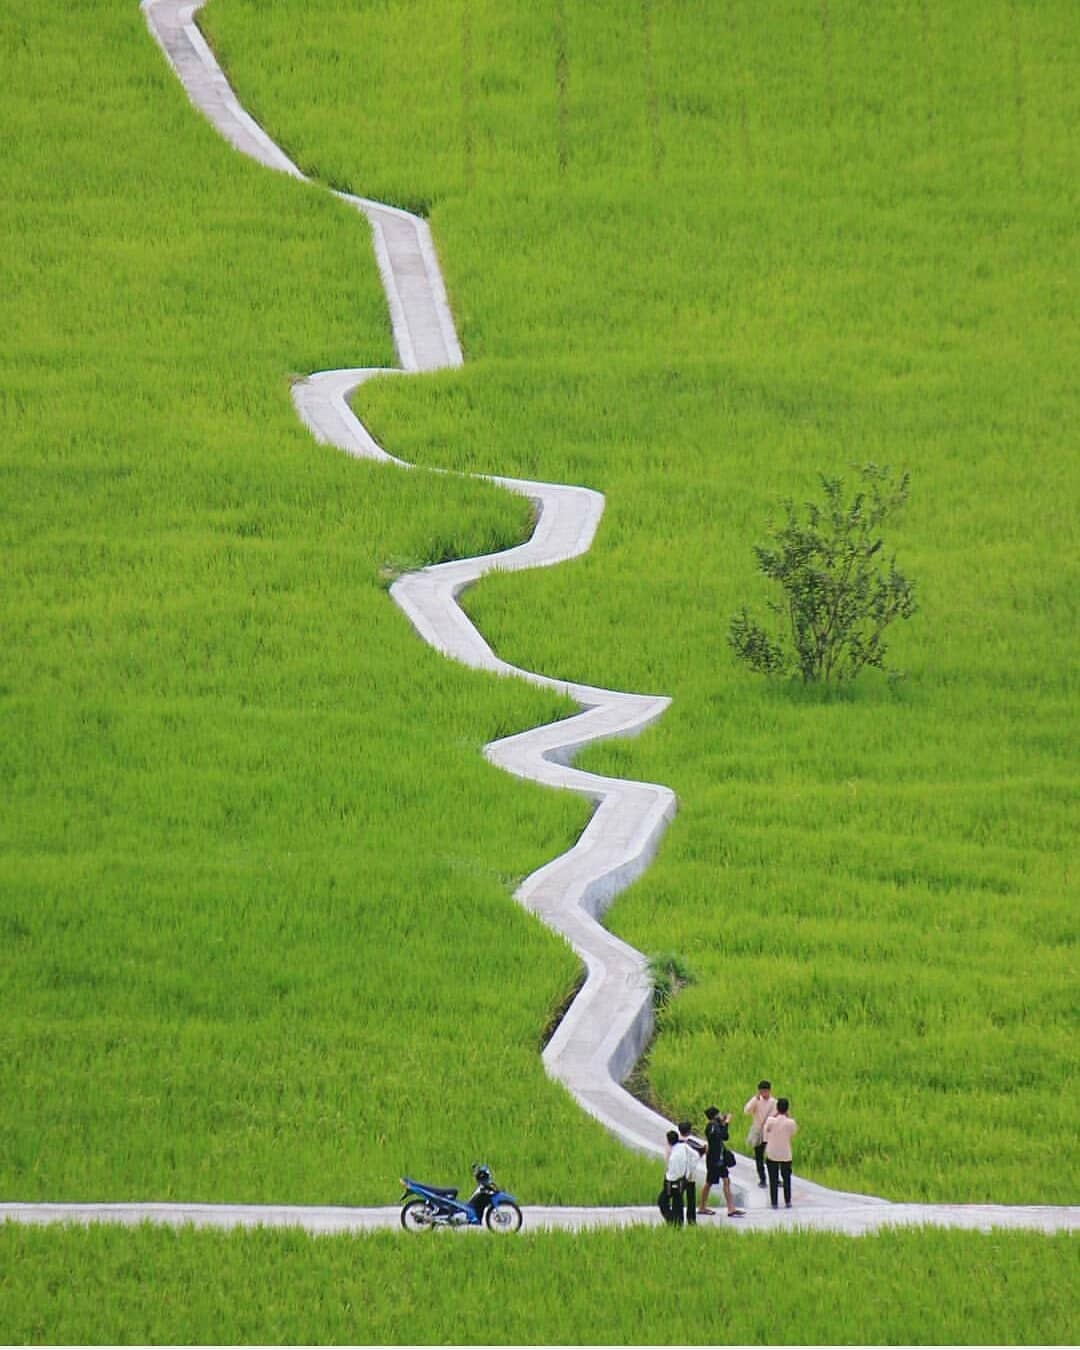 Wisata Jalan Setapak di Ngarai Sianok Bukit Tinggi